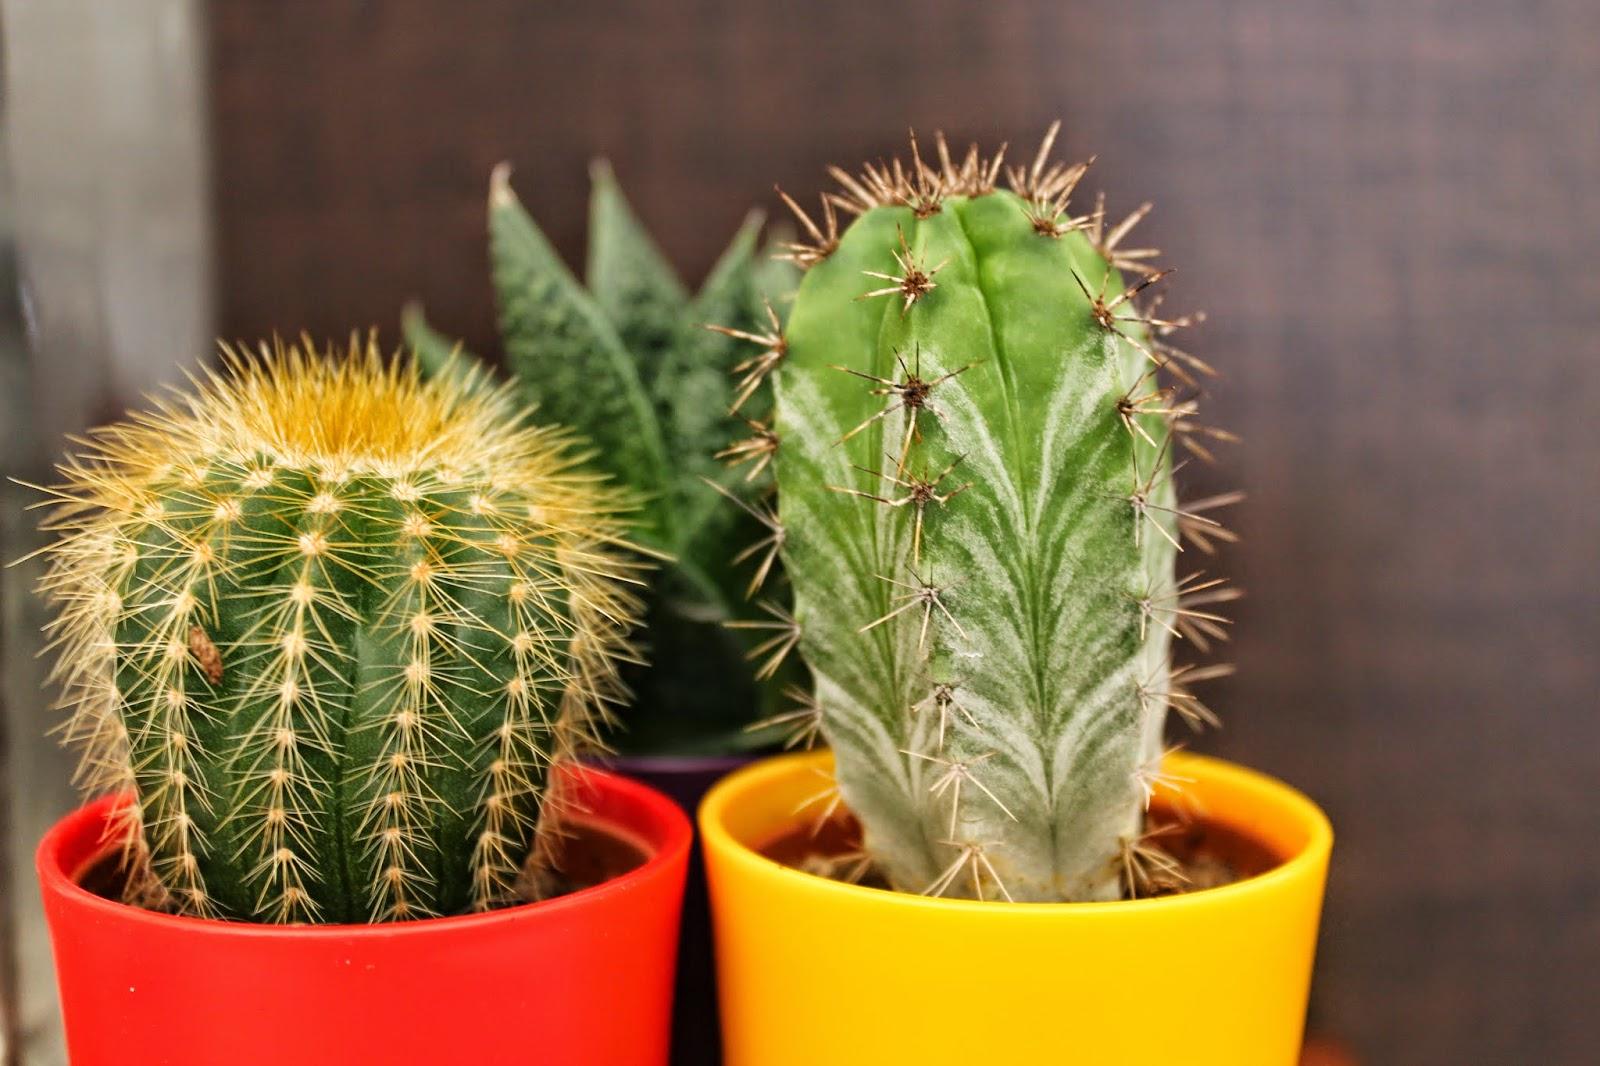 asda-plant